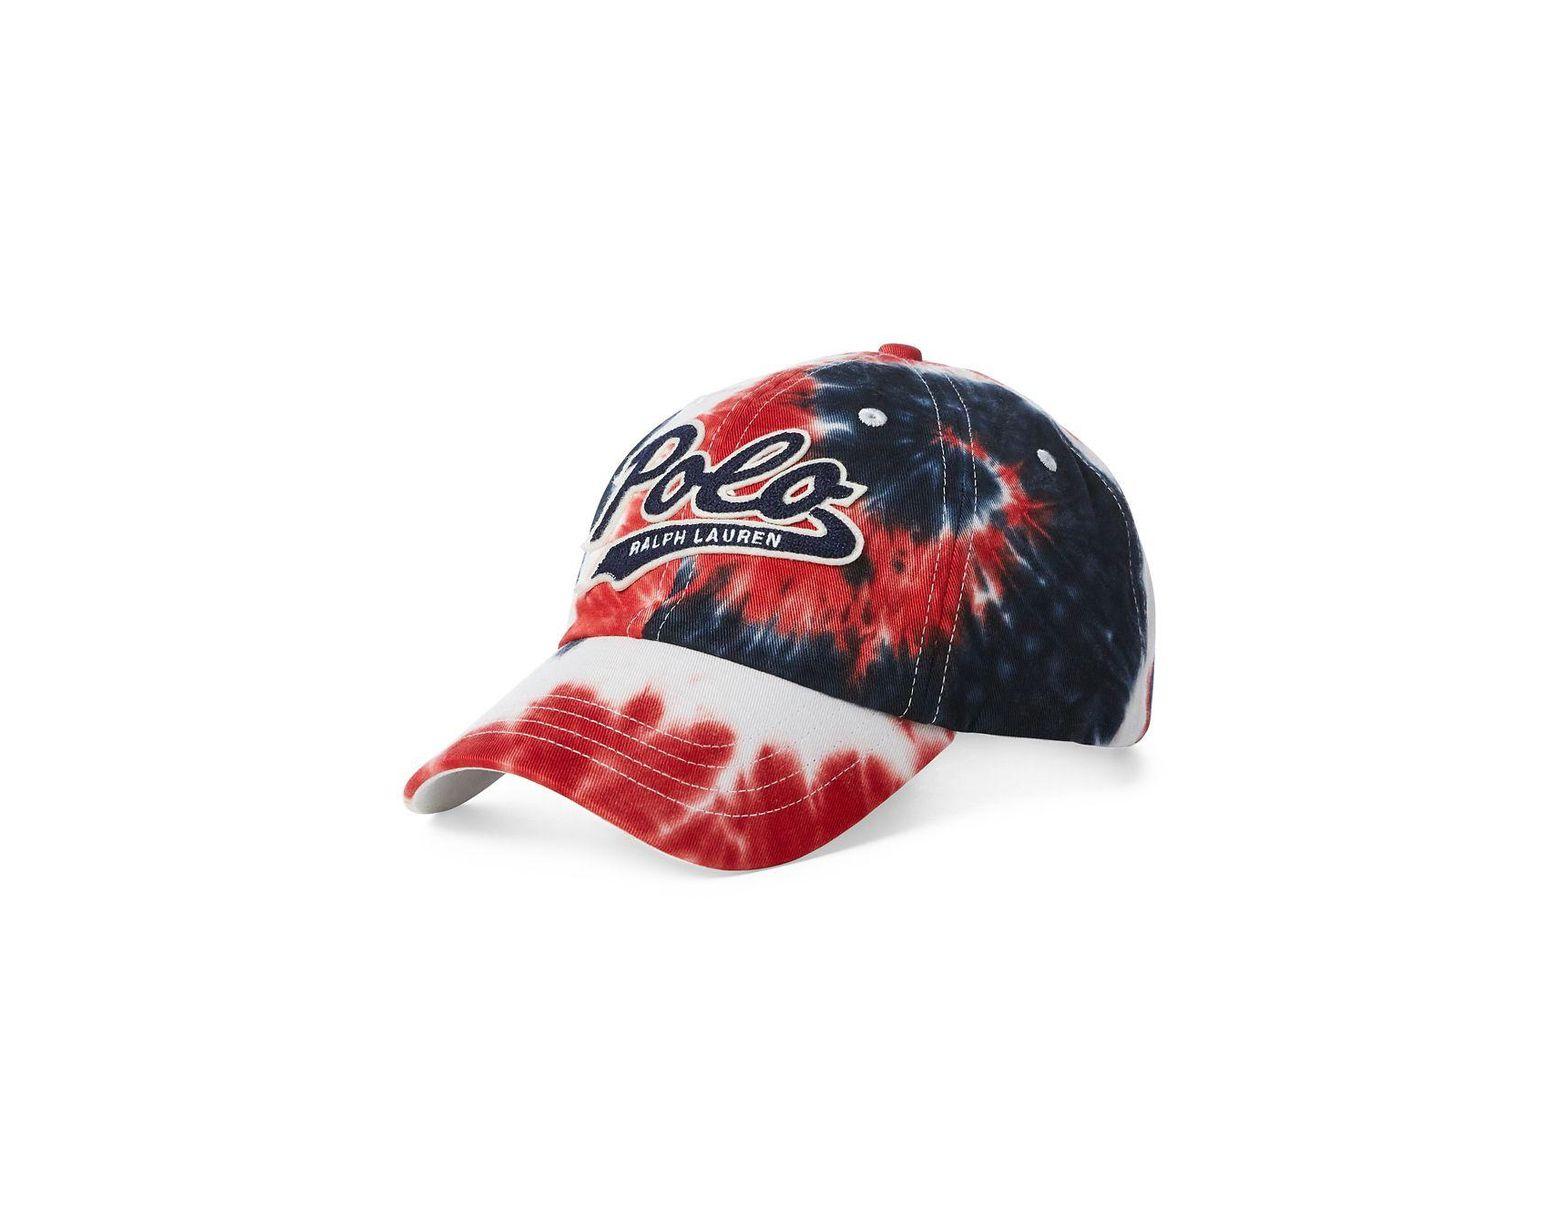 1fea8380fa Men's Red Big & Tall Tie Dye Hat